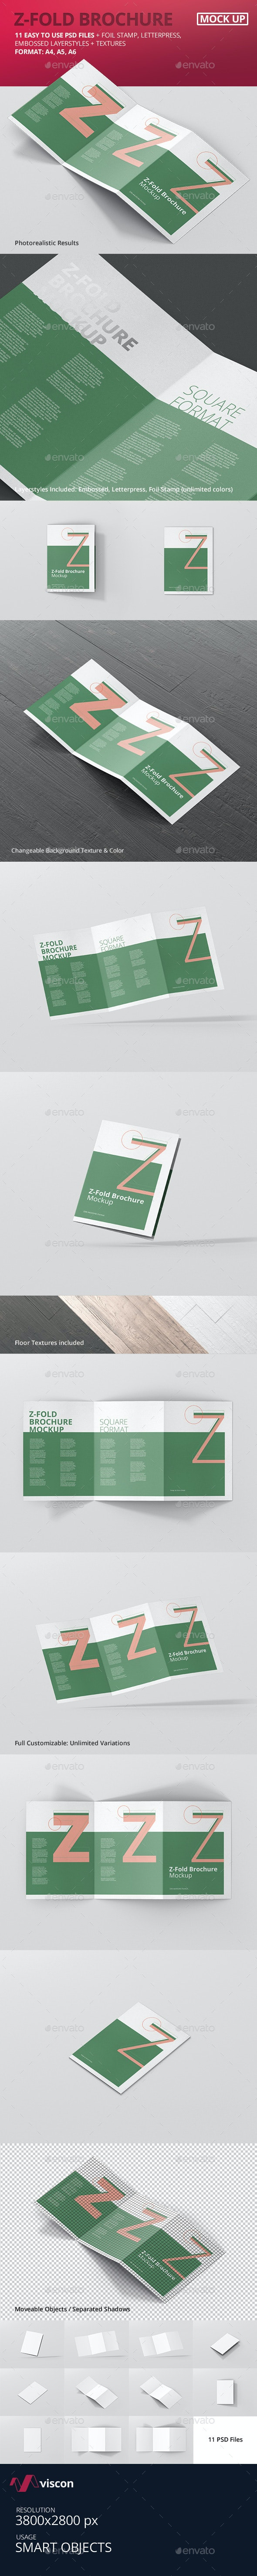 Z-Fold Brochure Mockup - Din A4 A5 A6 - Brochures Print